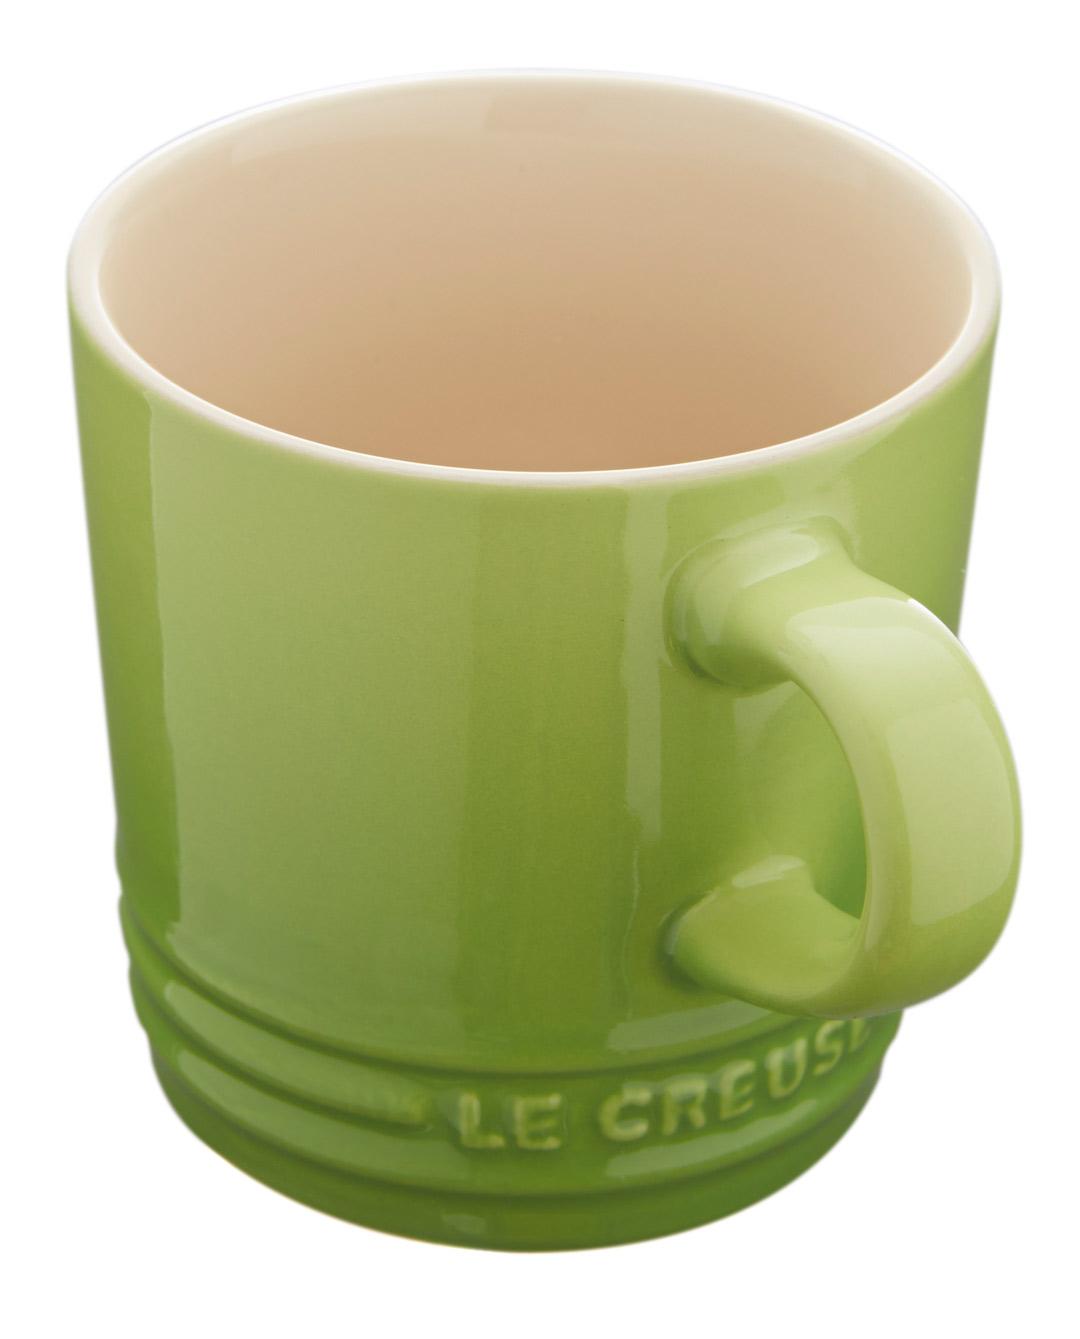 Le Creuset Espressokopp 70 ml Palm